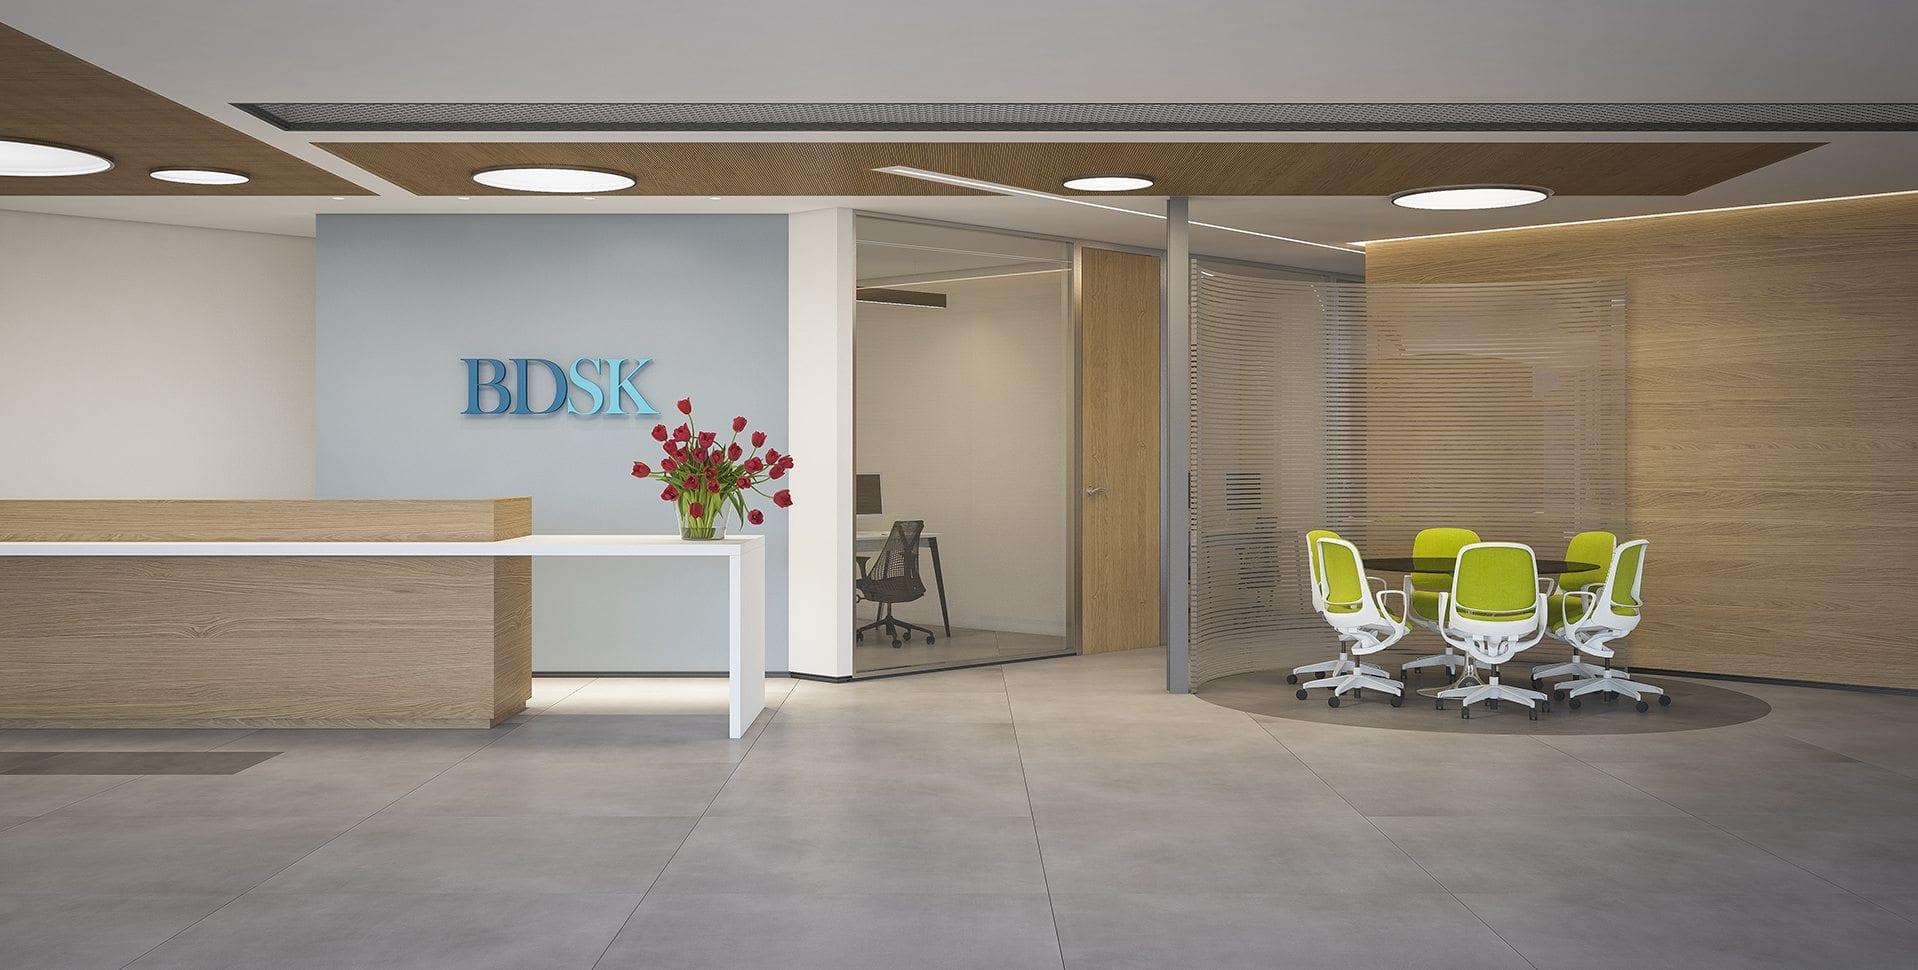 Maayan-Golan_Architectural-Visualization_ bdsk-office-visualization_reception_design-dunski-architects_01